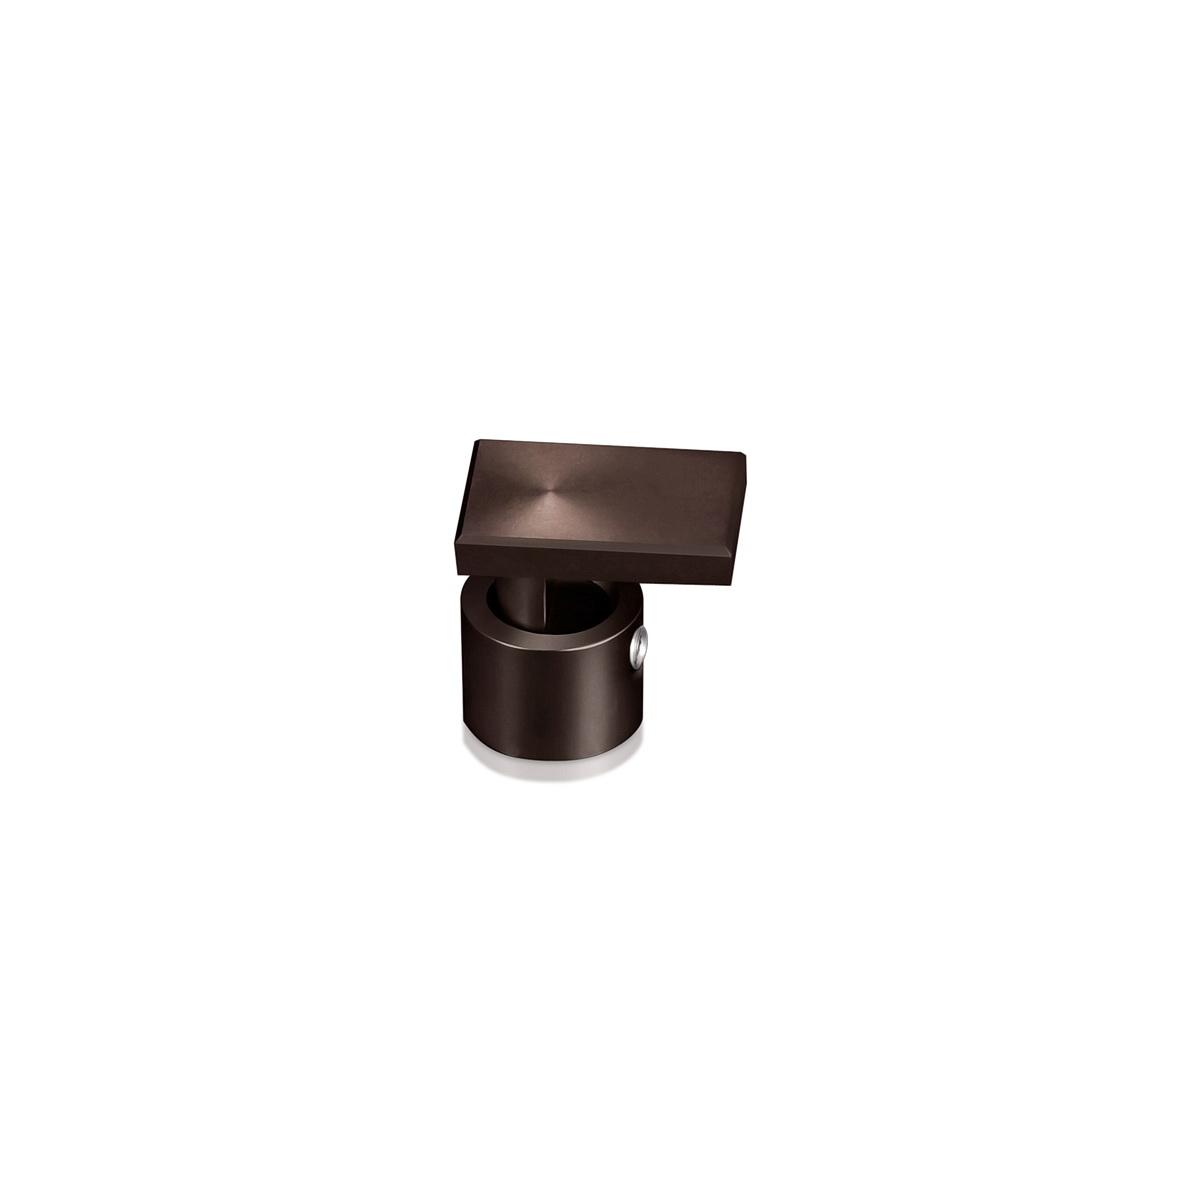 Rectangular Aluminum Edge Grip, Diameter 1/2'', Standoff 3/8'' Face: 3/4'' x 1/2'' Bronze Anodize Finish